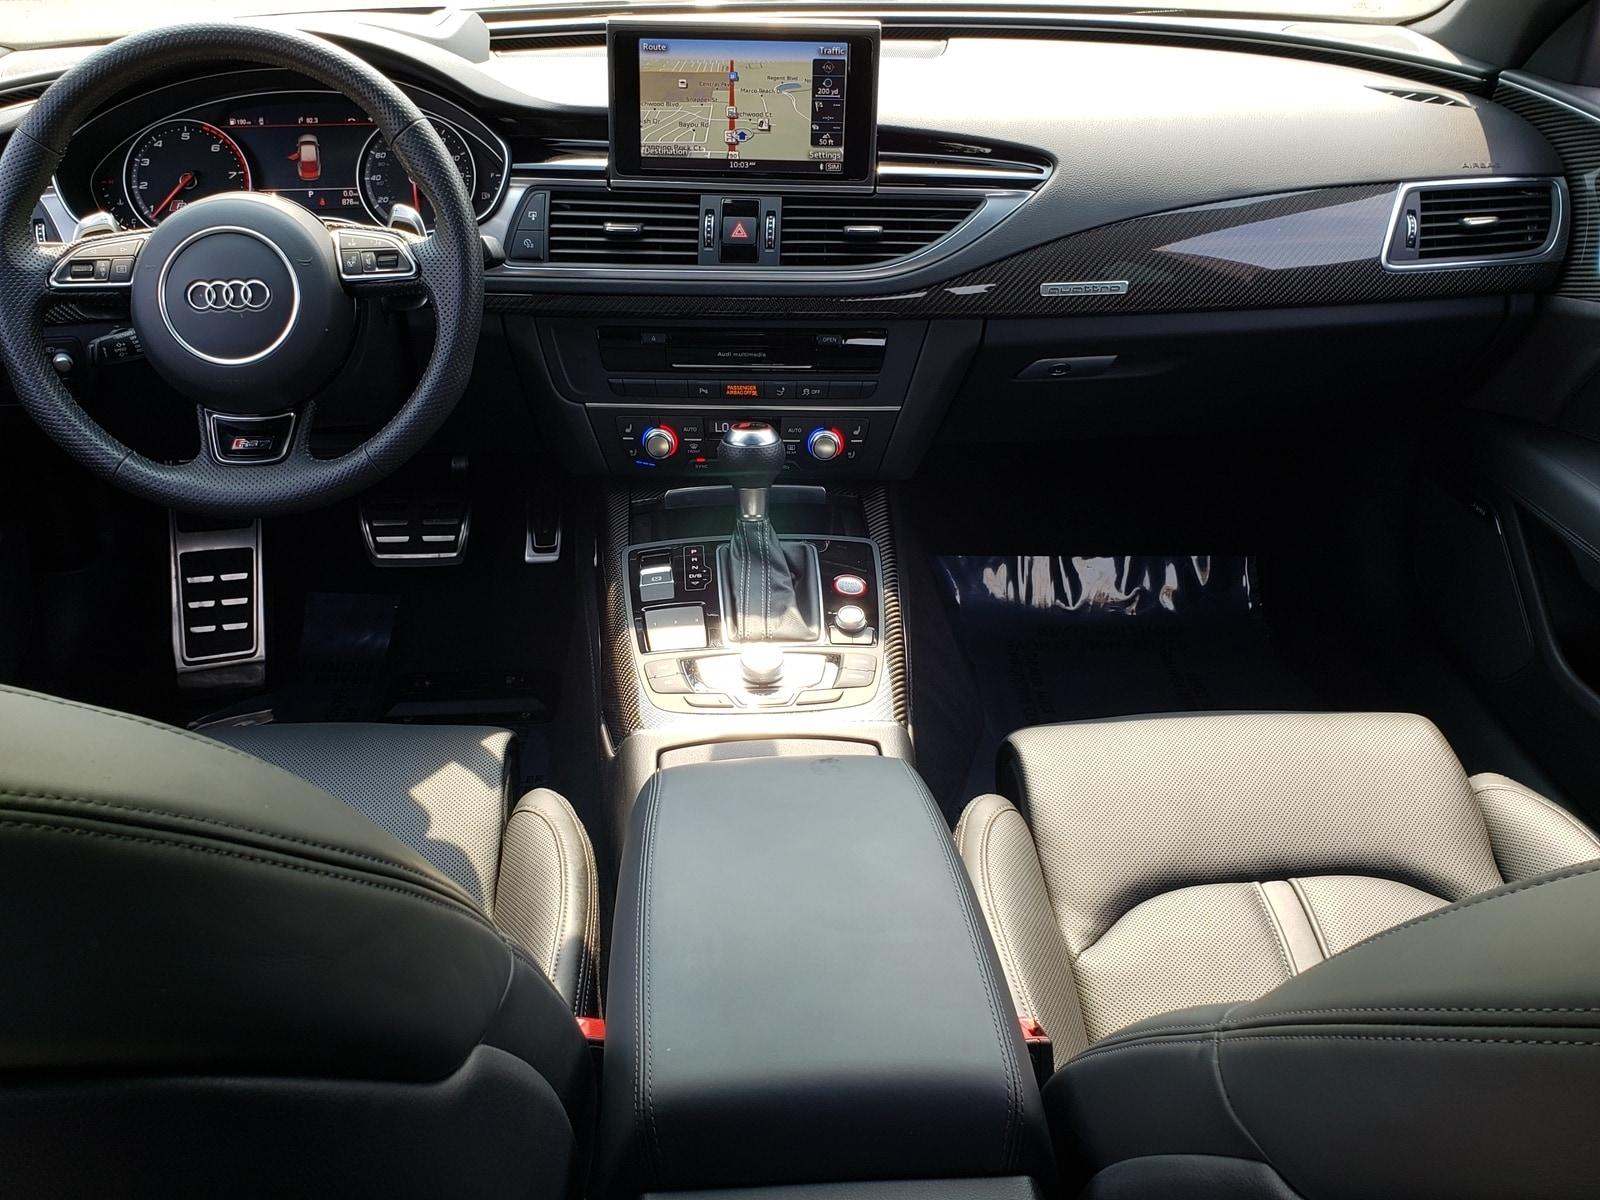 Used 2017 Audi Rs7 4 0 Tfsi Prestige Rare Car New 120 185 00